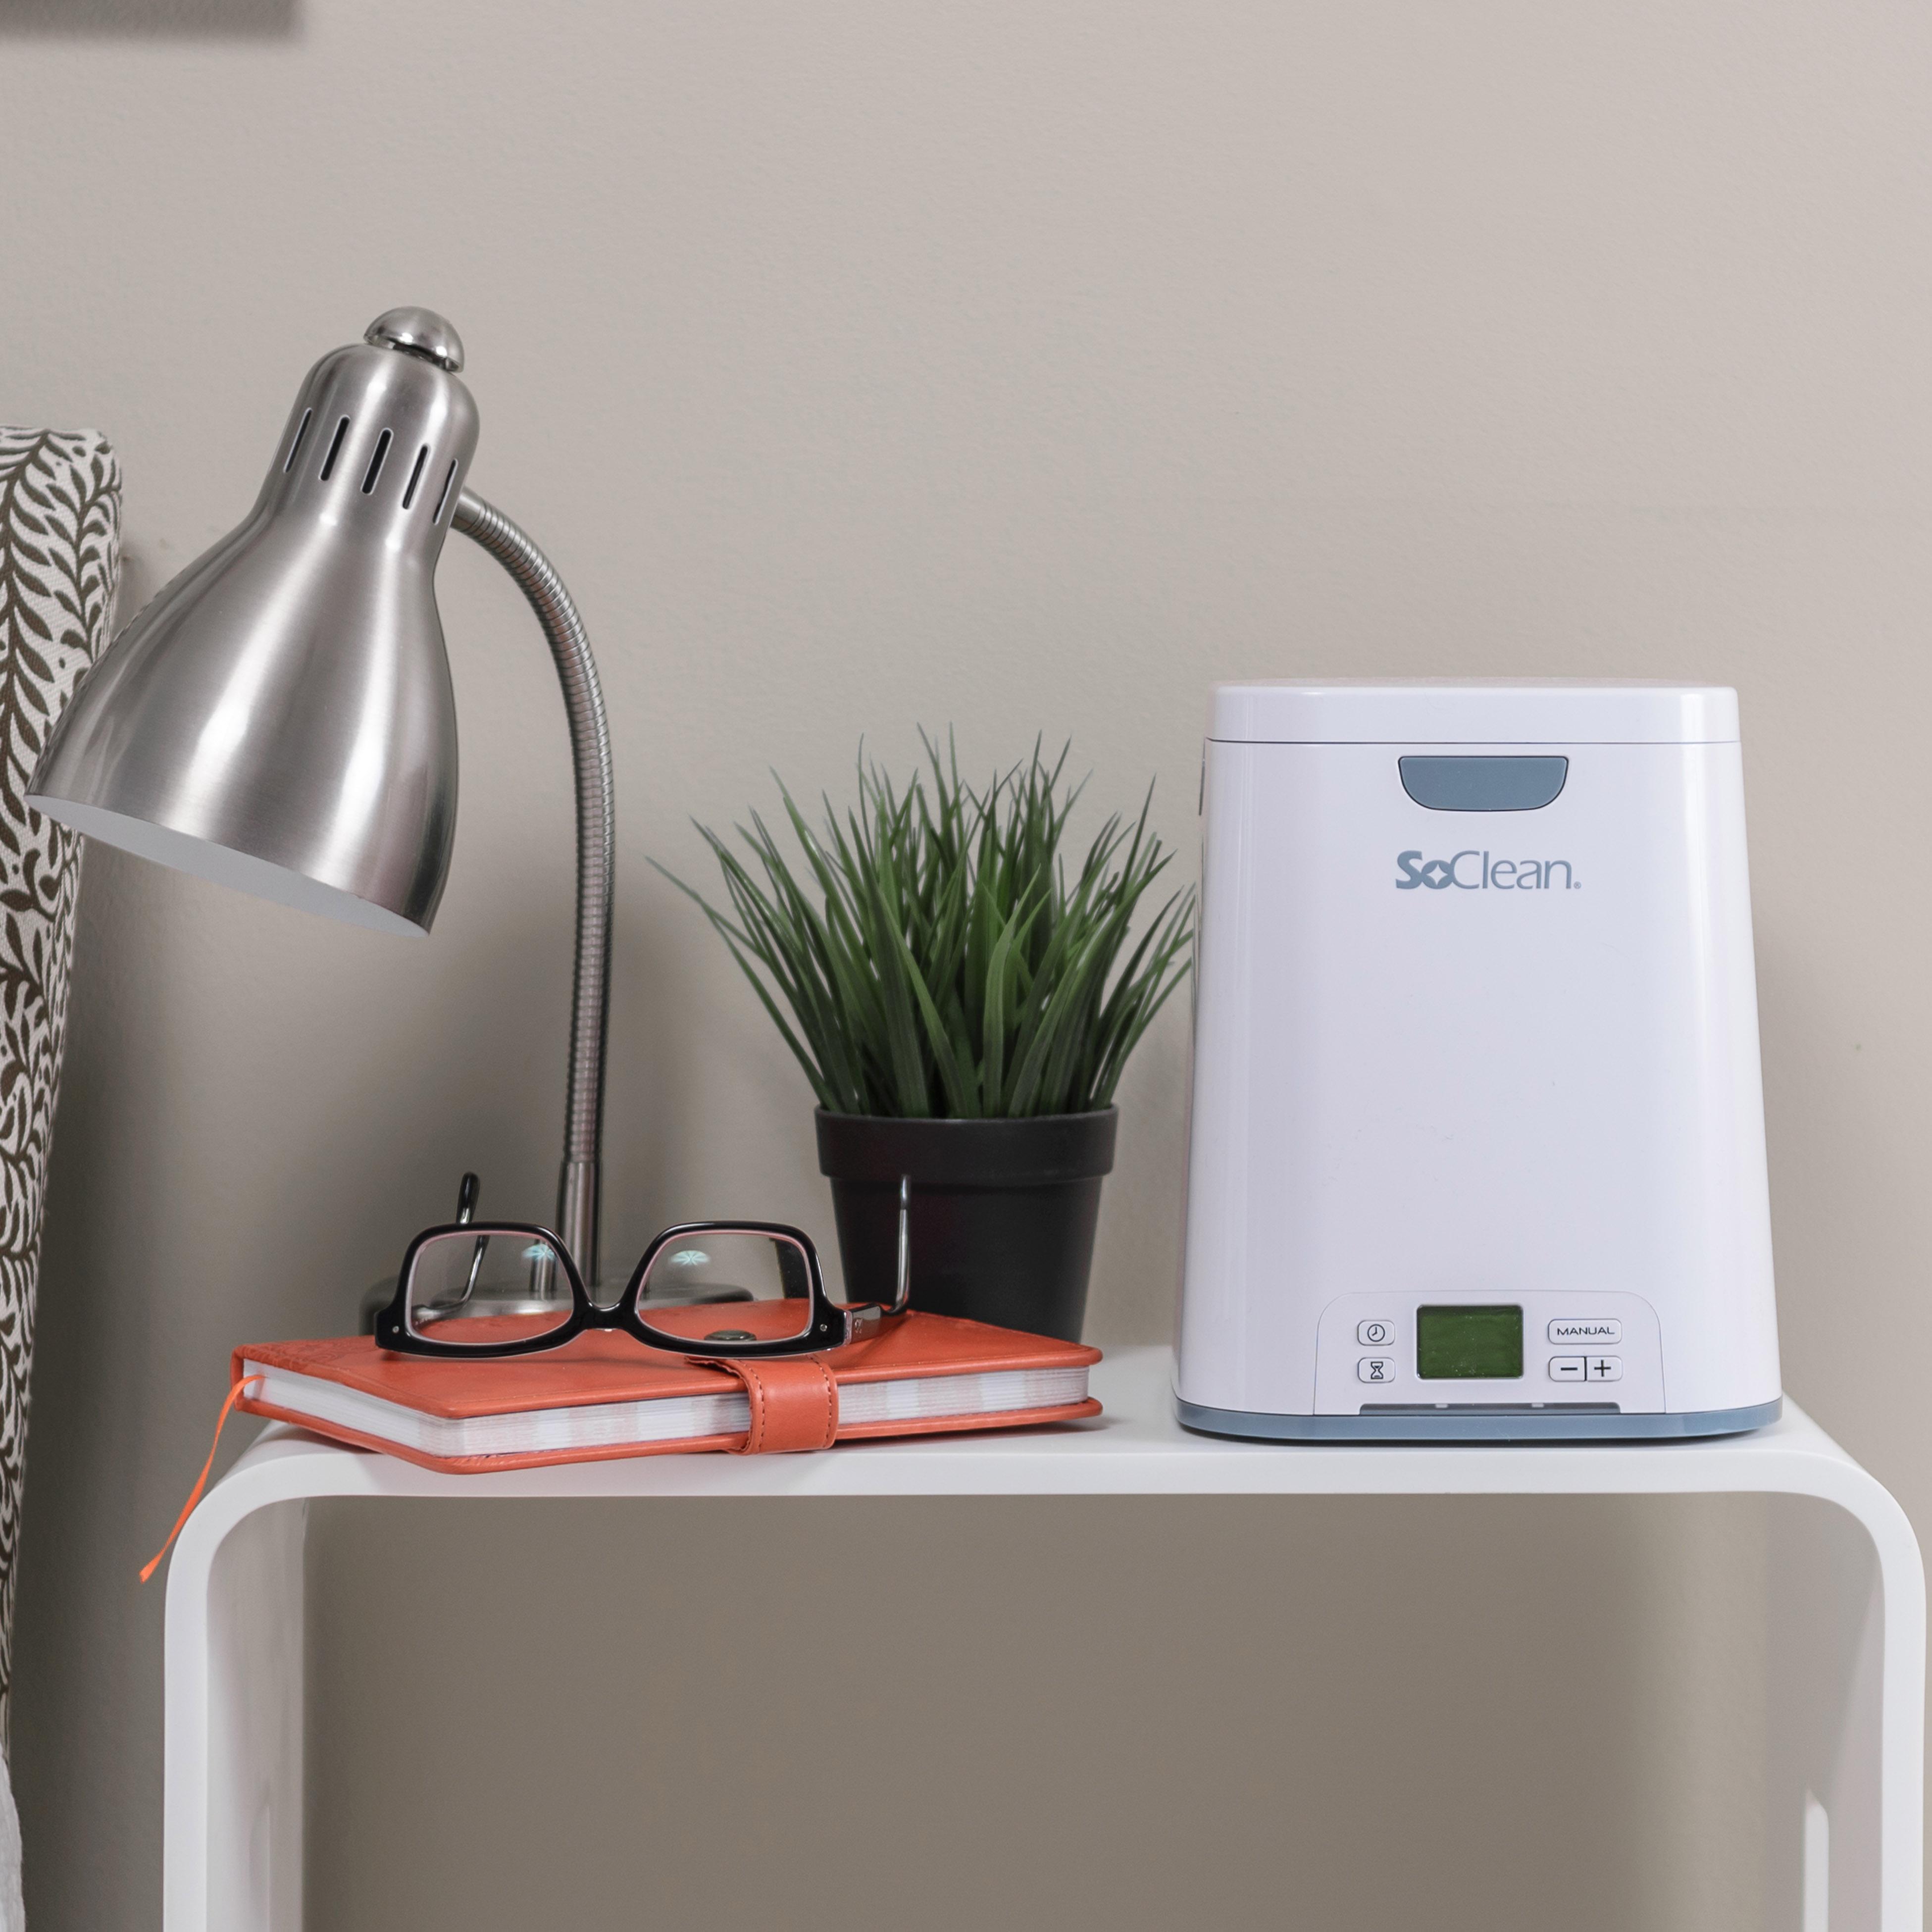 SoClean 2: How to Clean CPAP Tubing